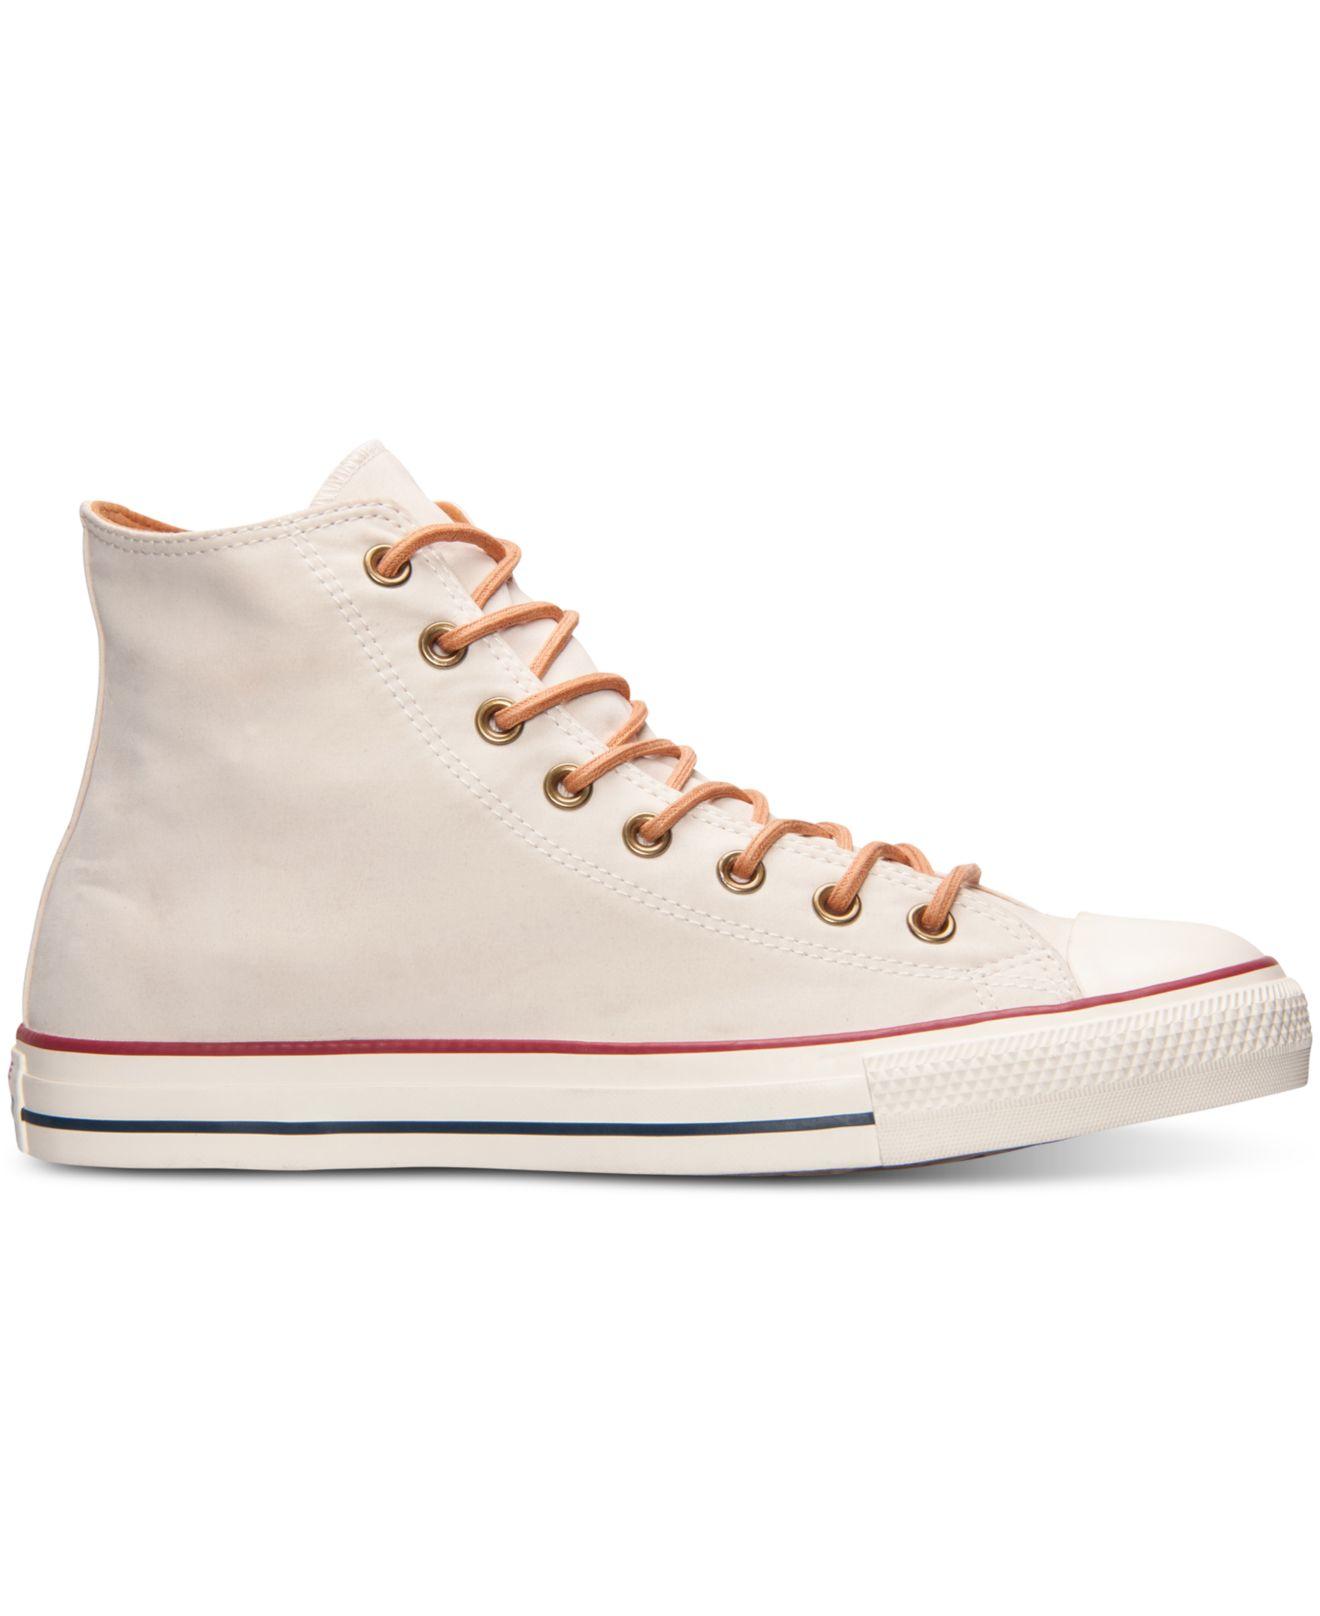 e171cef44ef3 Lyst - Converse Men s Chuck Taylor Hi Peached Canvas Casual Sneakers ...